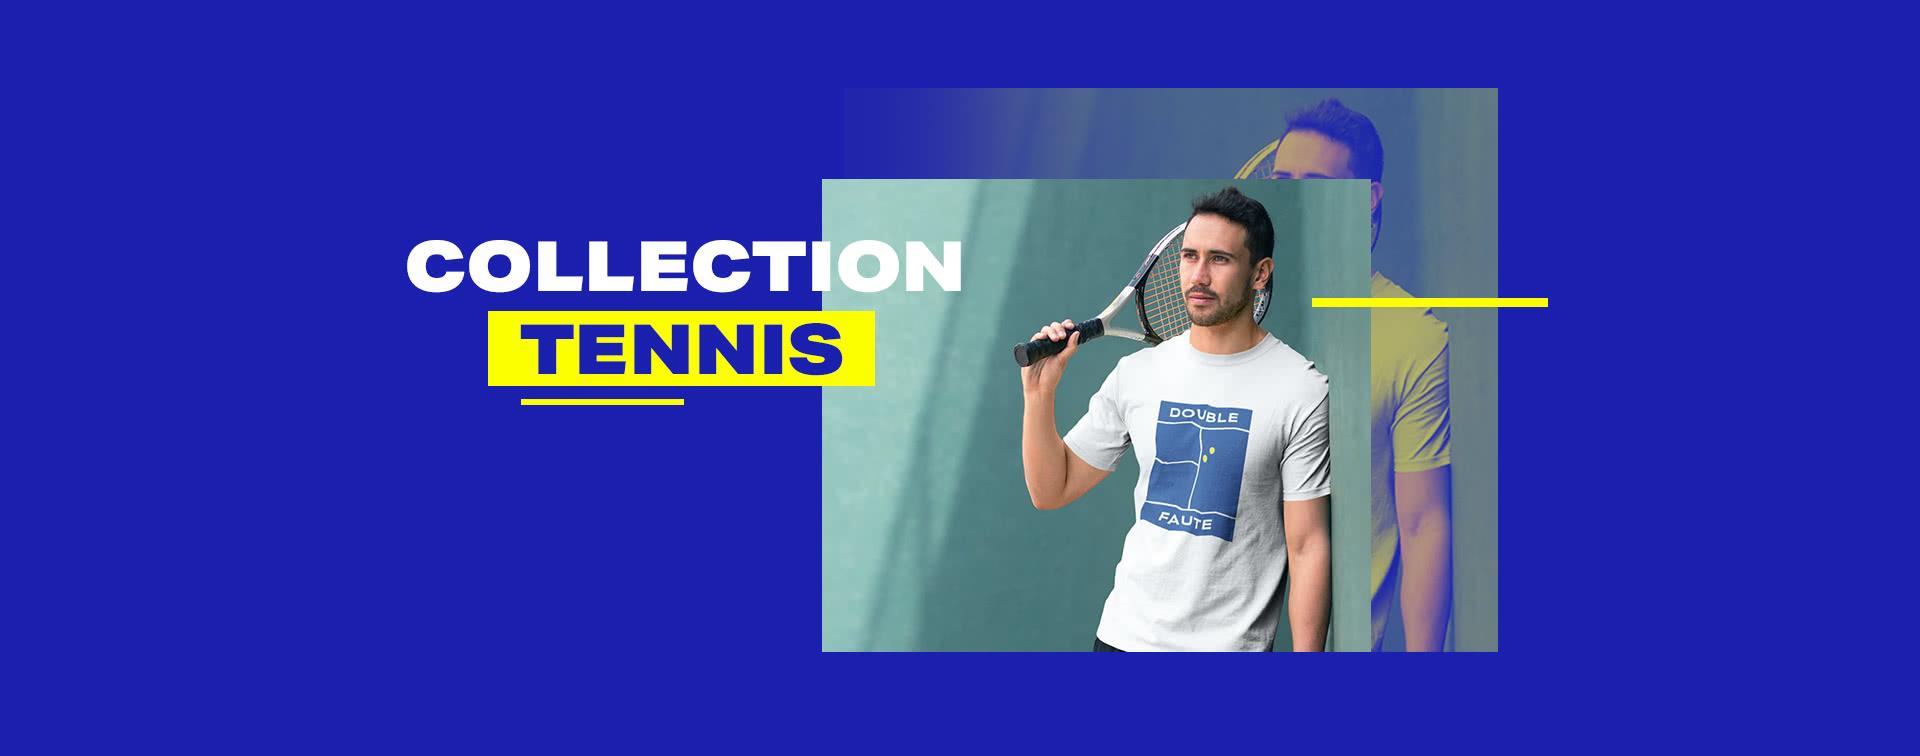 Nouvelle collection tennis